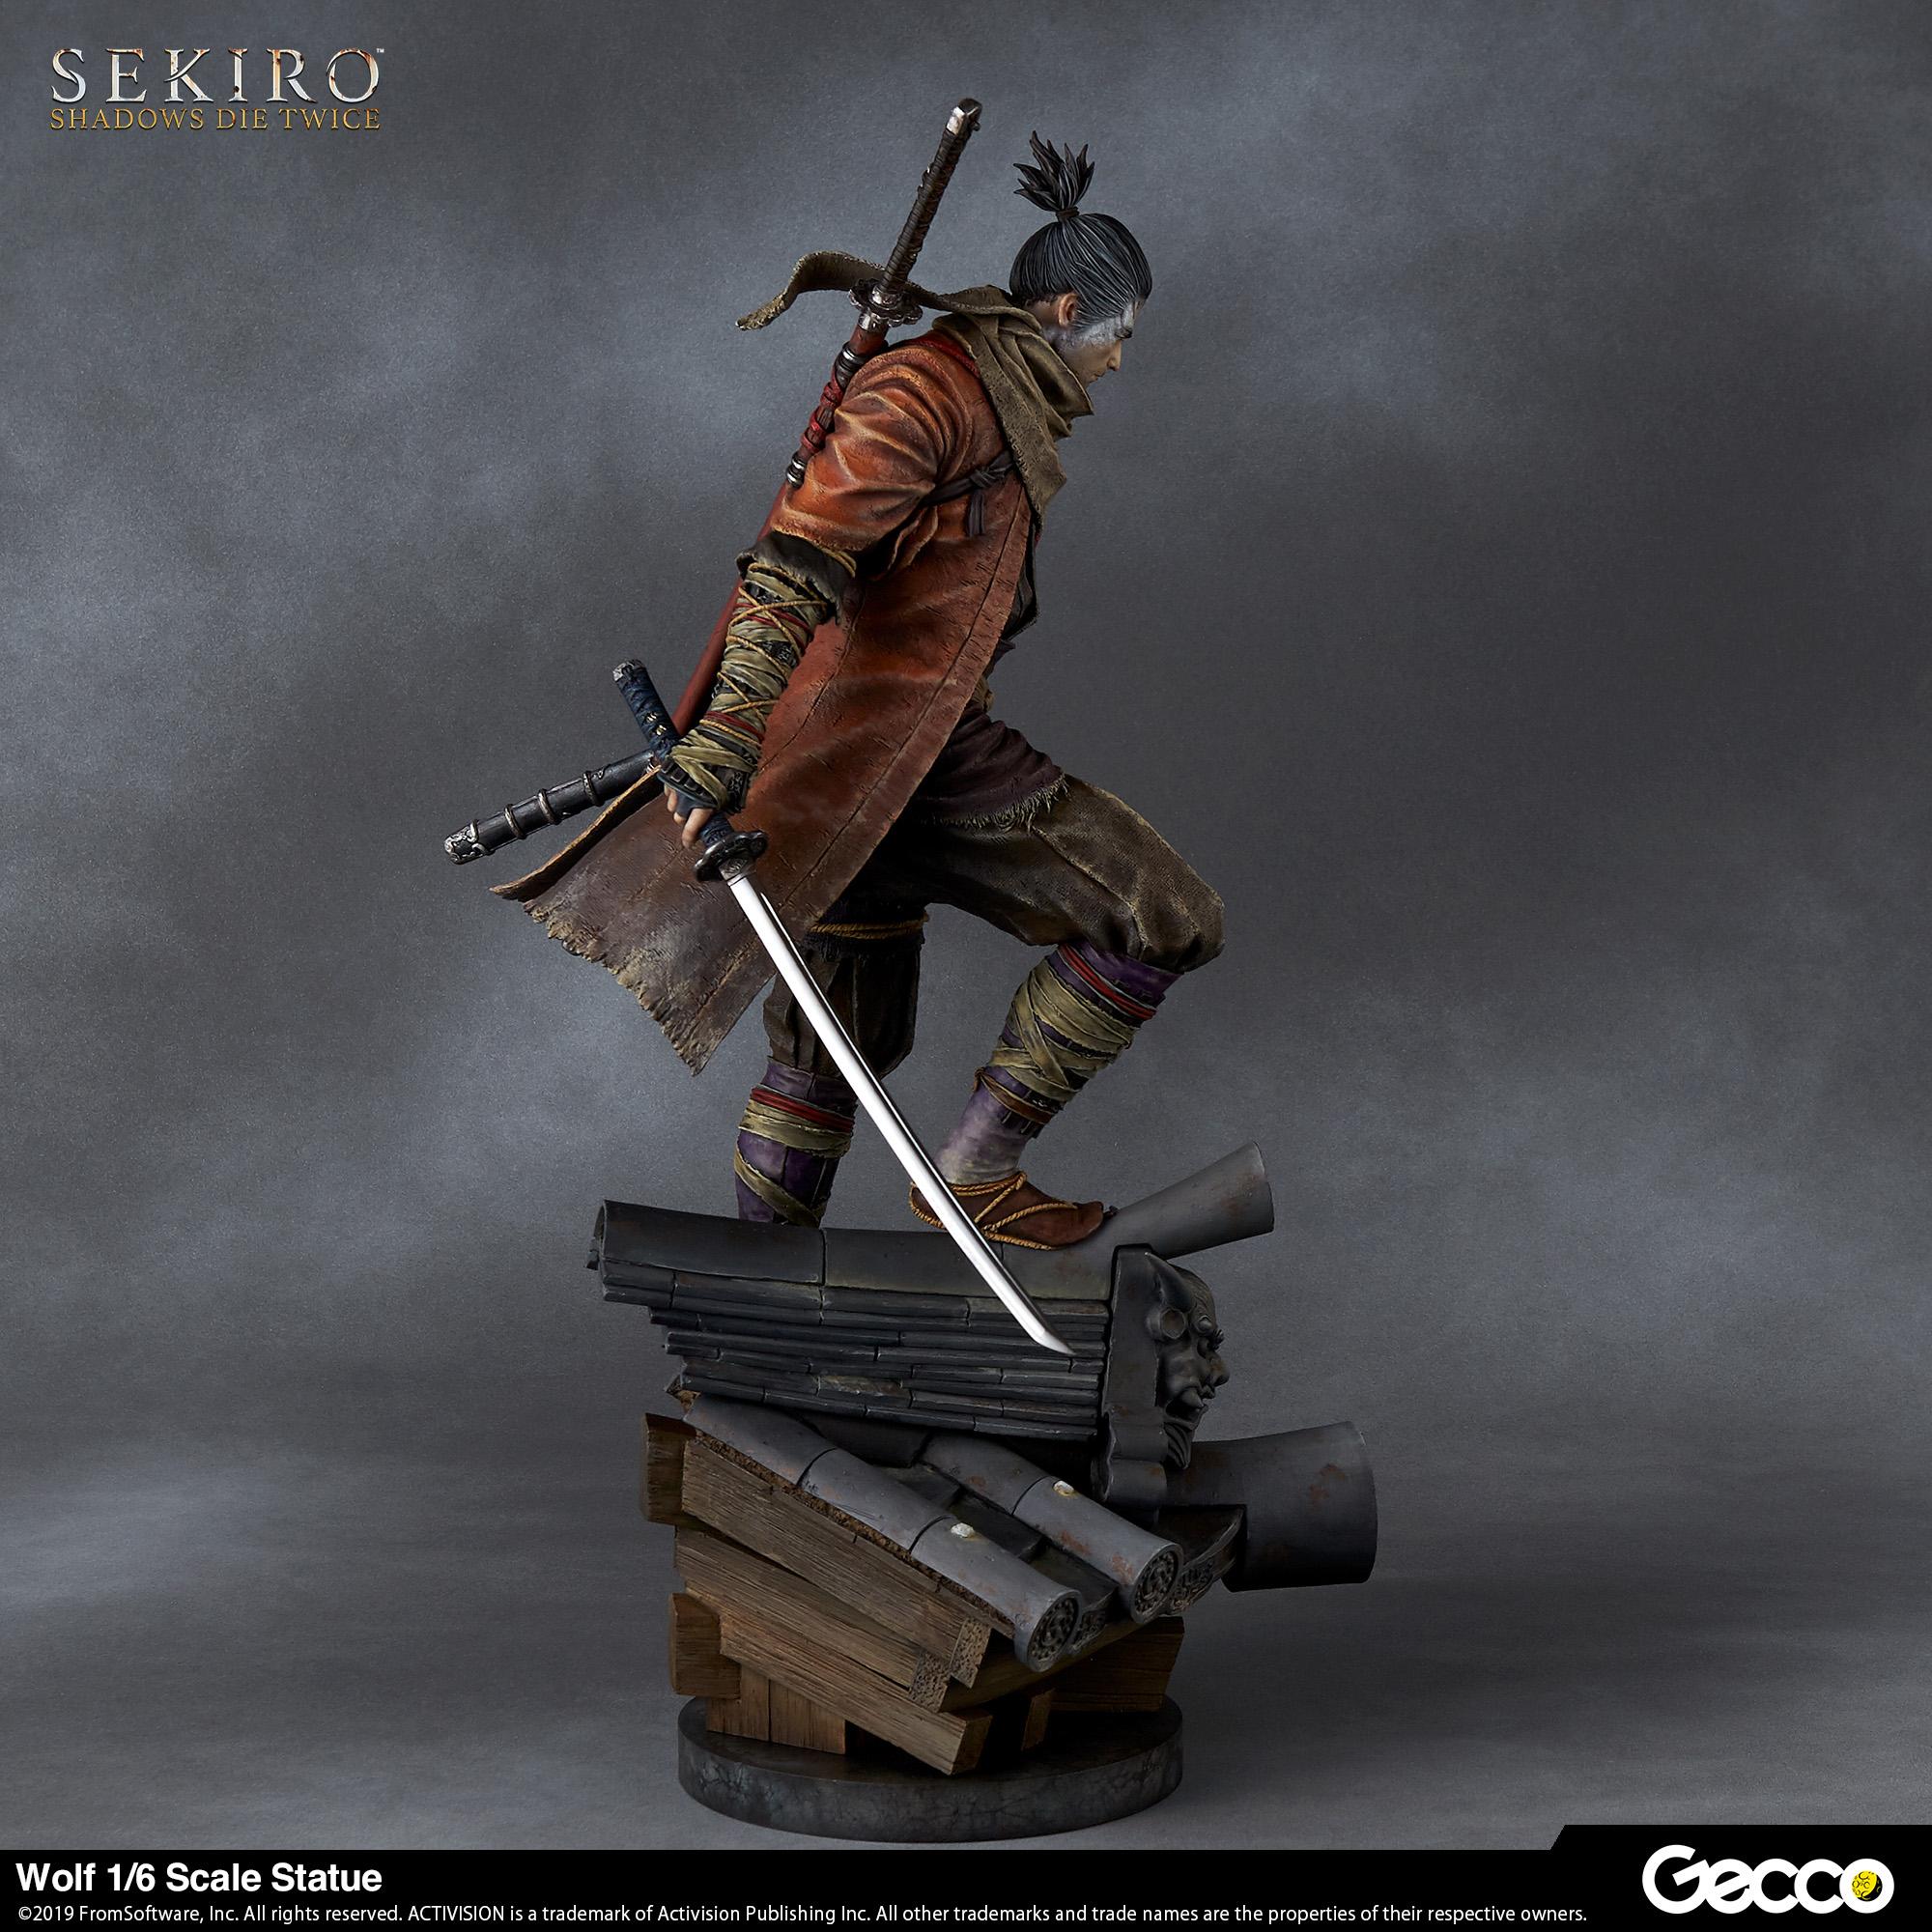 Link a Sekiro_Shadows_die_Twice_Wolf_Okami_Lupo_Statue_Figure_Gecco-1 (8)